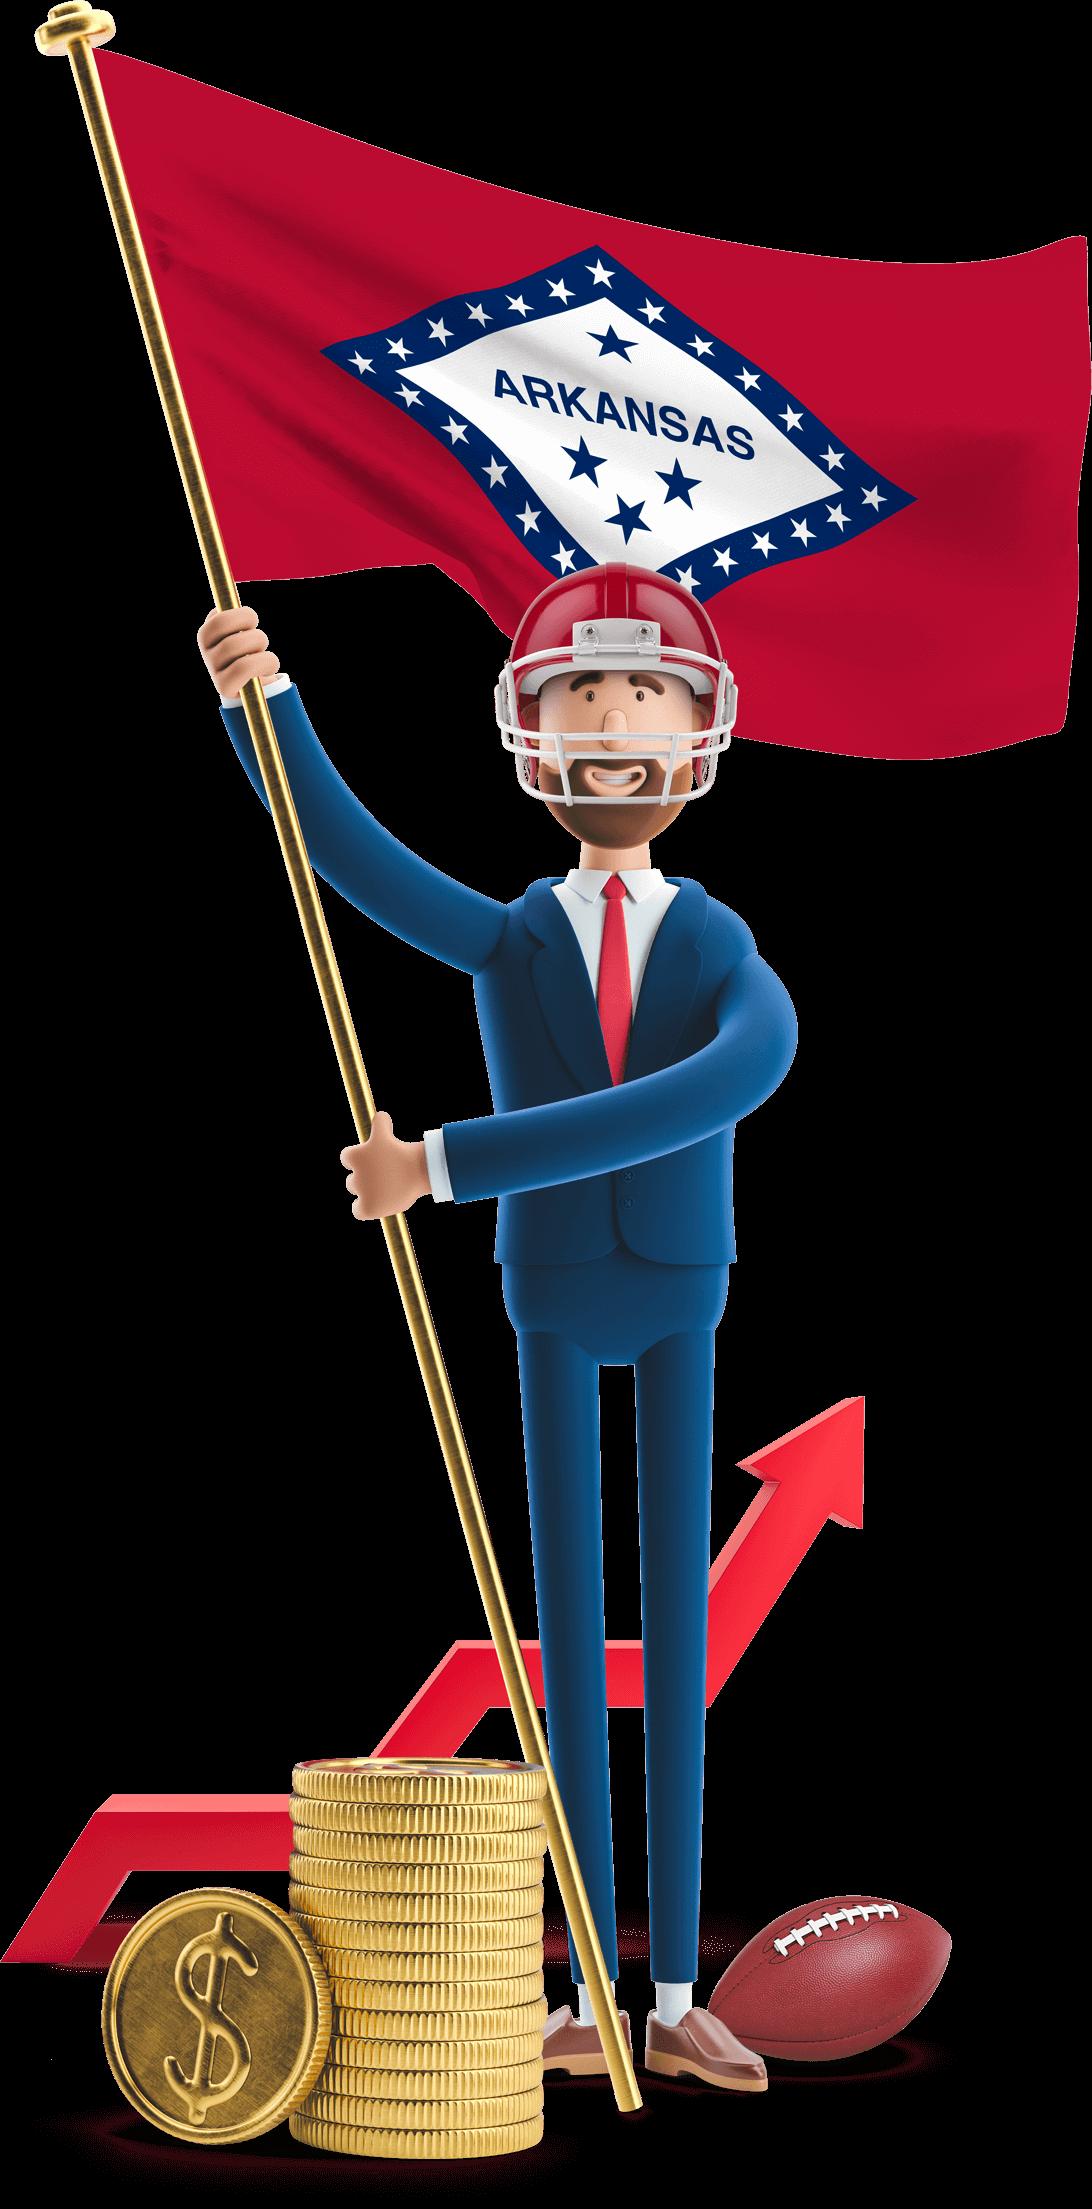 Arkansas flag held by MetCredit USA businessman who's wearing a football helmet